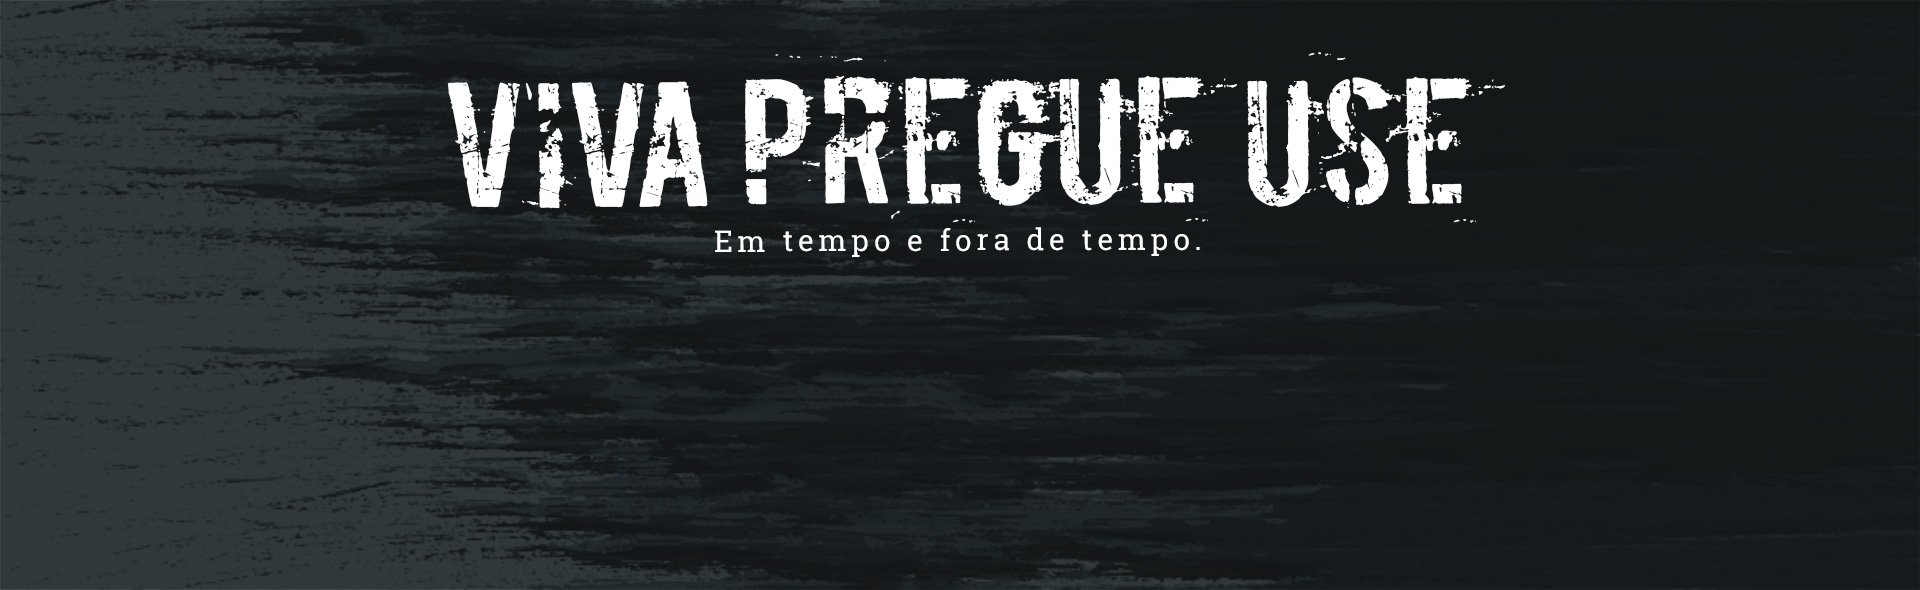 3_VivaPregueUse - Bíblia